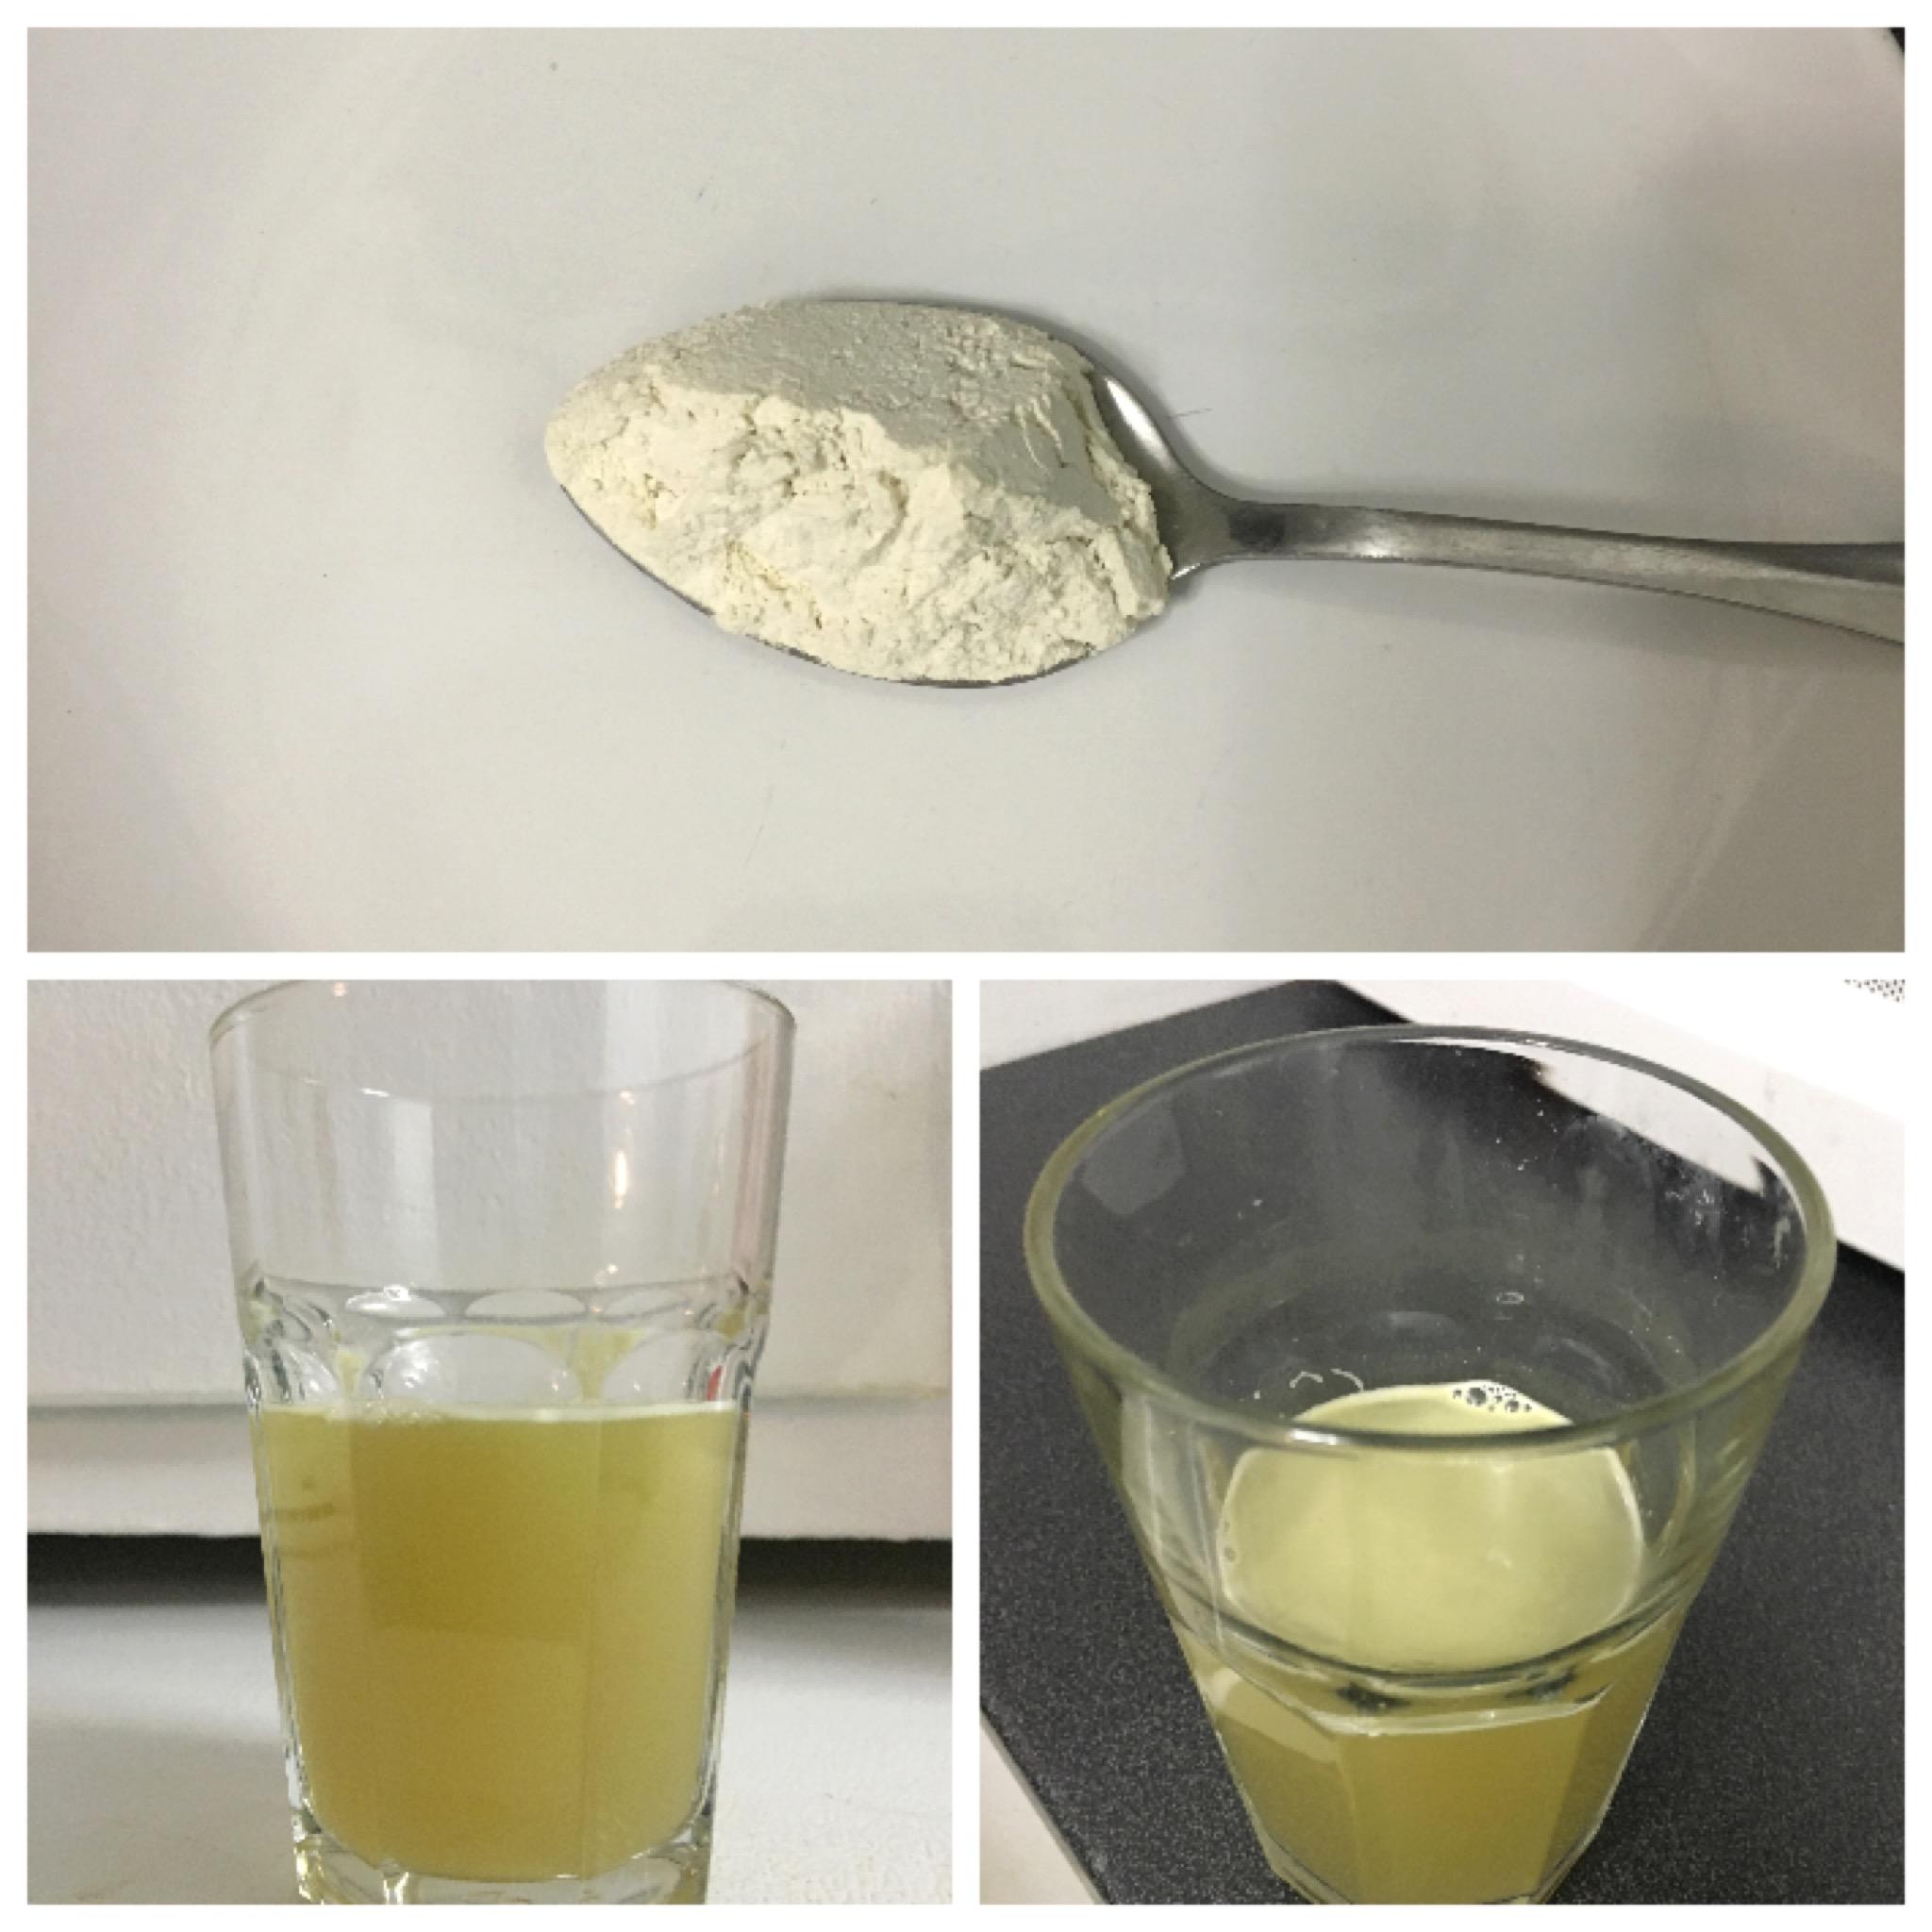 Raw sugarcane powder (also known as raw sugarcane juice powder or raw sugarcane water powder)